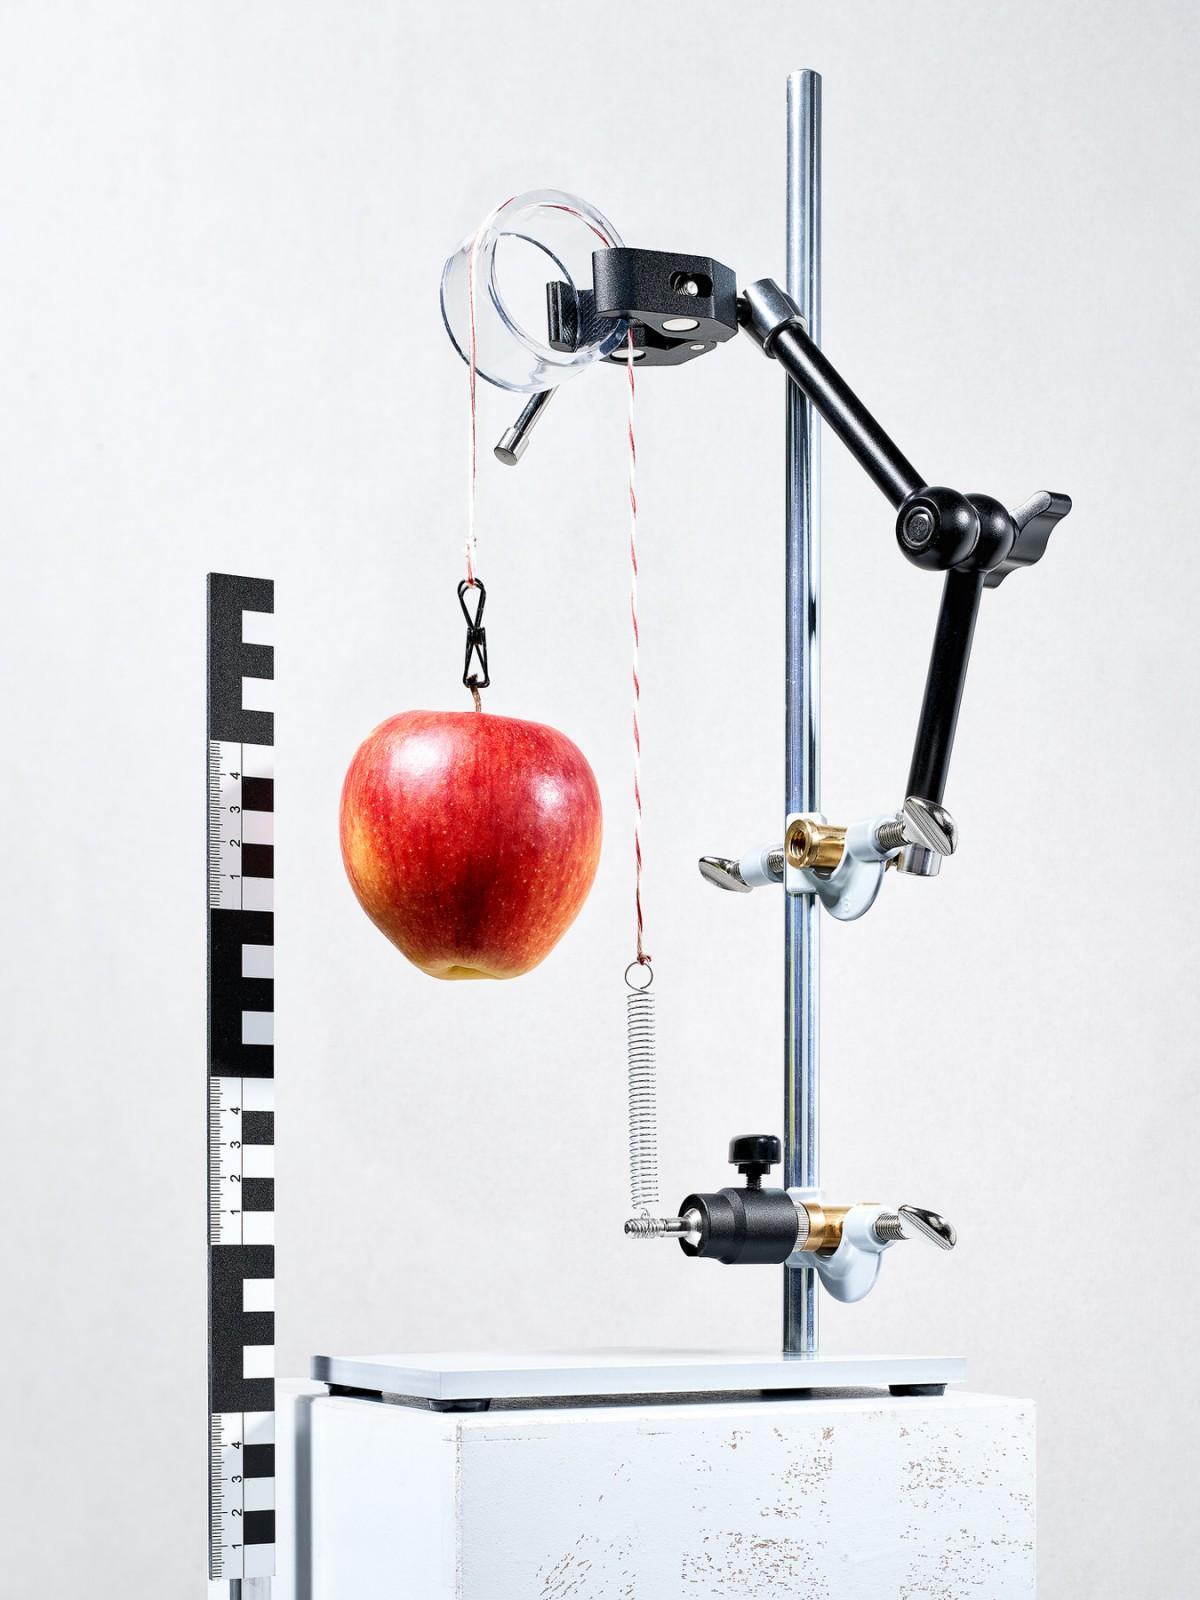 Newton and the Apple von Felix Schöppner